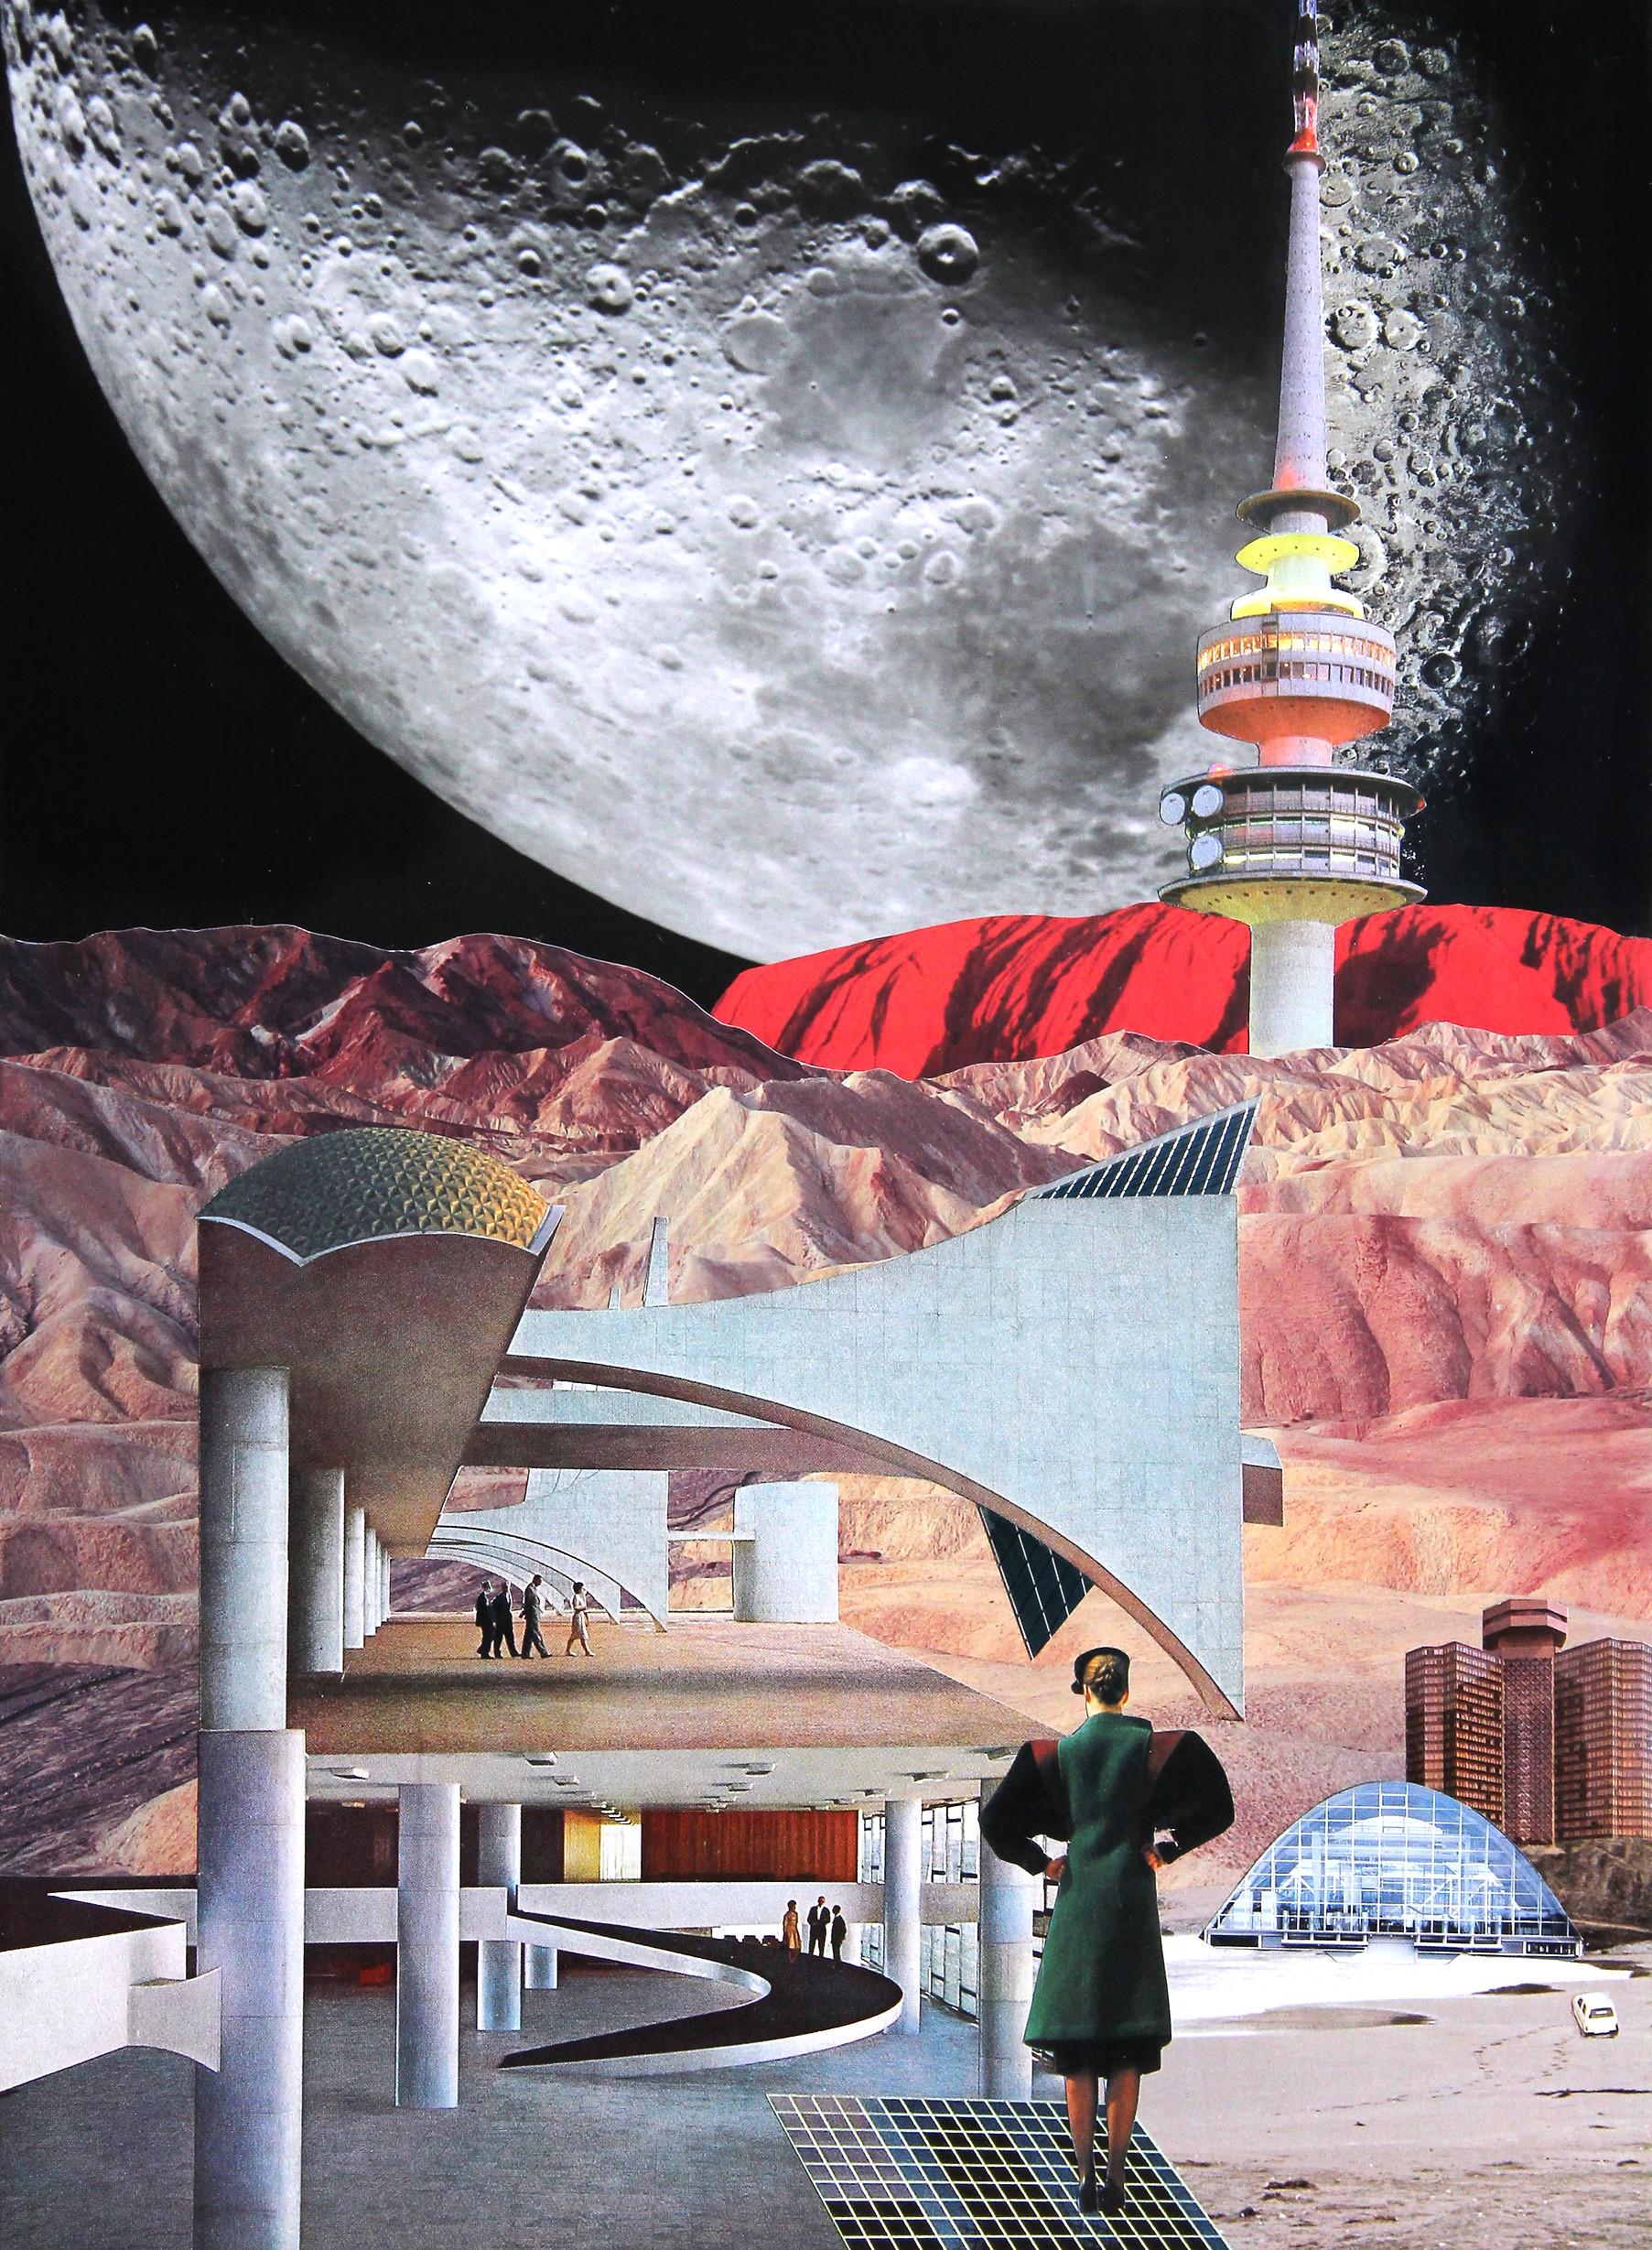 CLINTON GORST. LIFE ON MARS. collage art